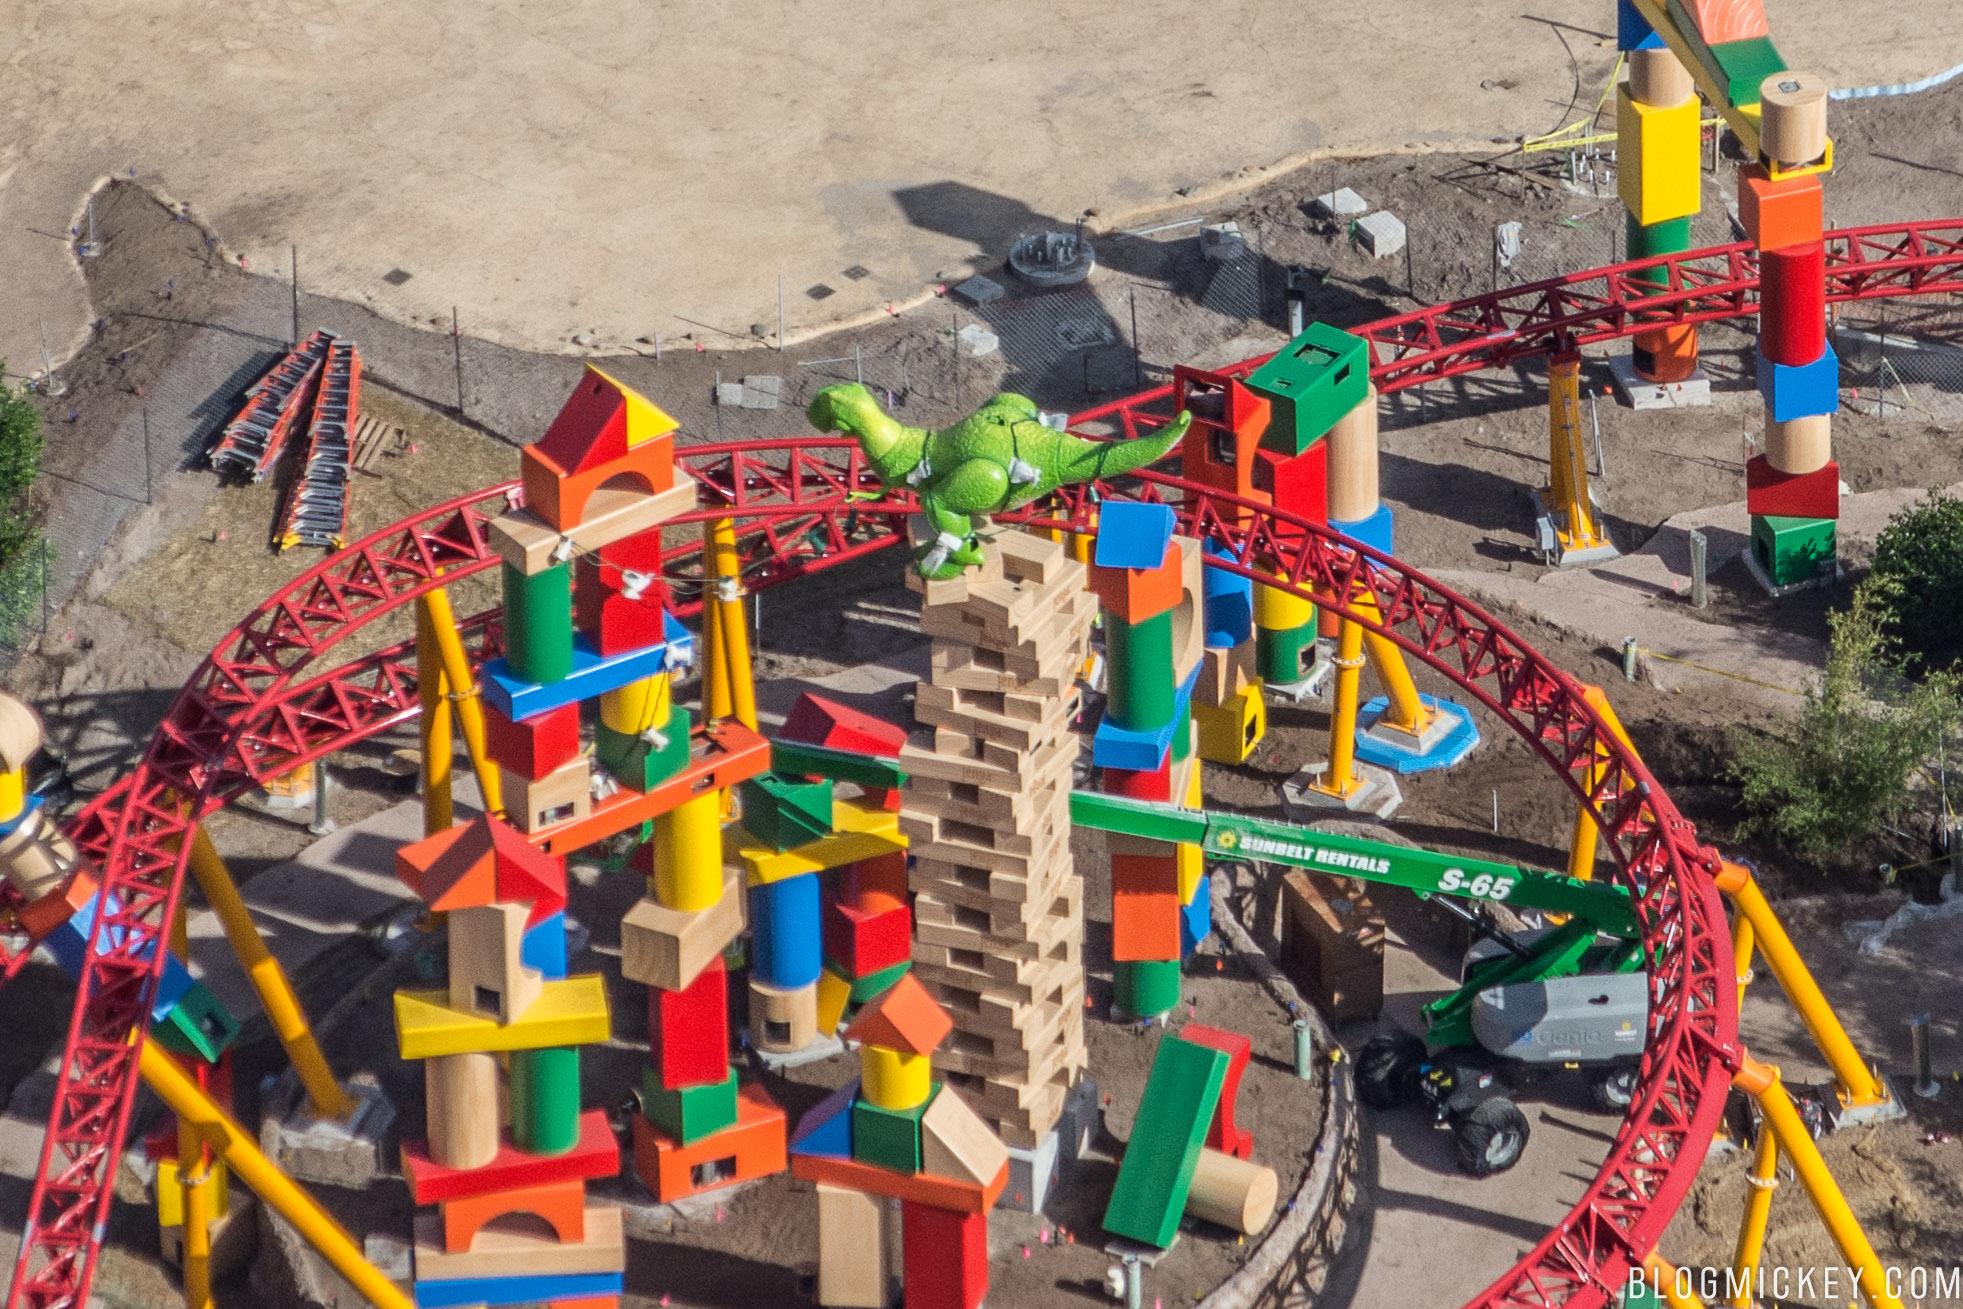 toy-story-land-rex-figure-11062017-2.jpg